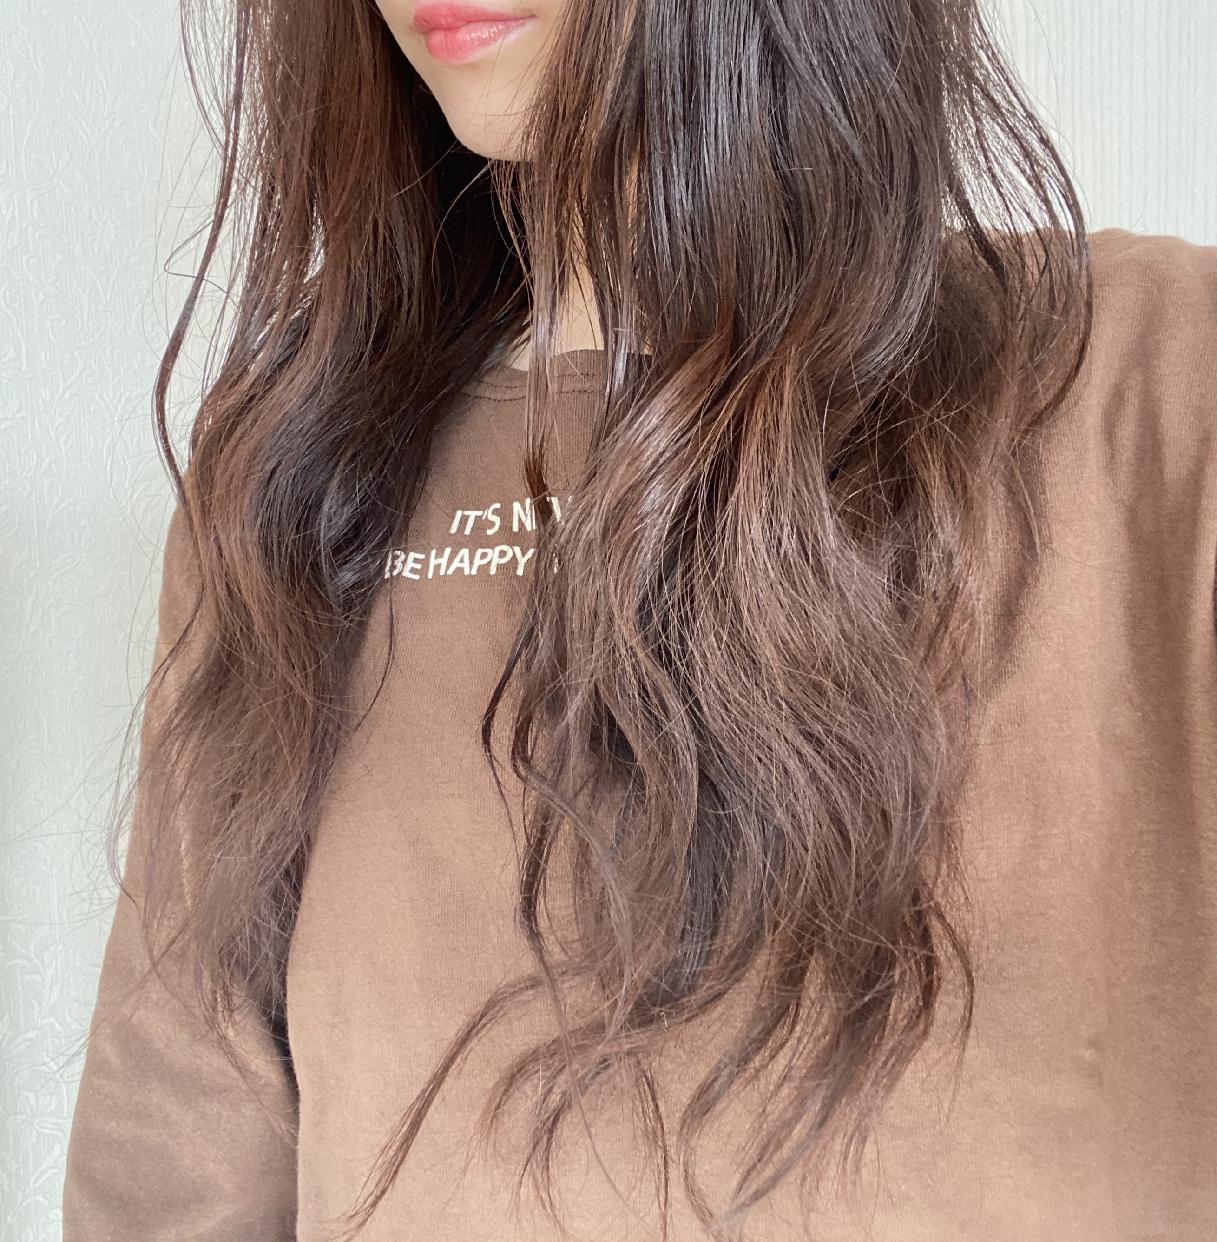 AIRY & EASY(エアリー&イージー)グロッシーヘアジェルを使った yu.さんの口コミ画像3